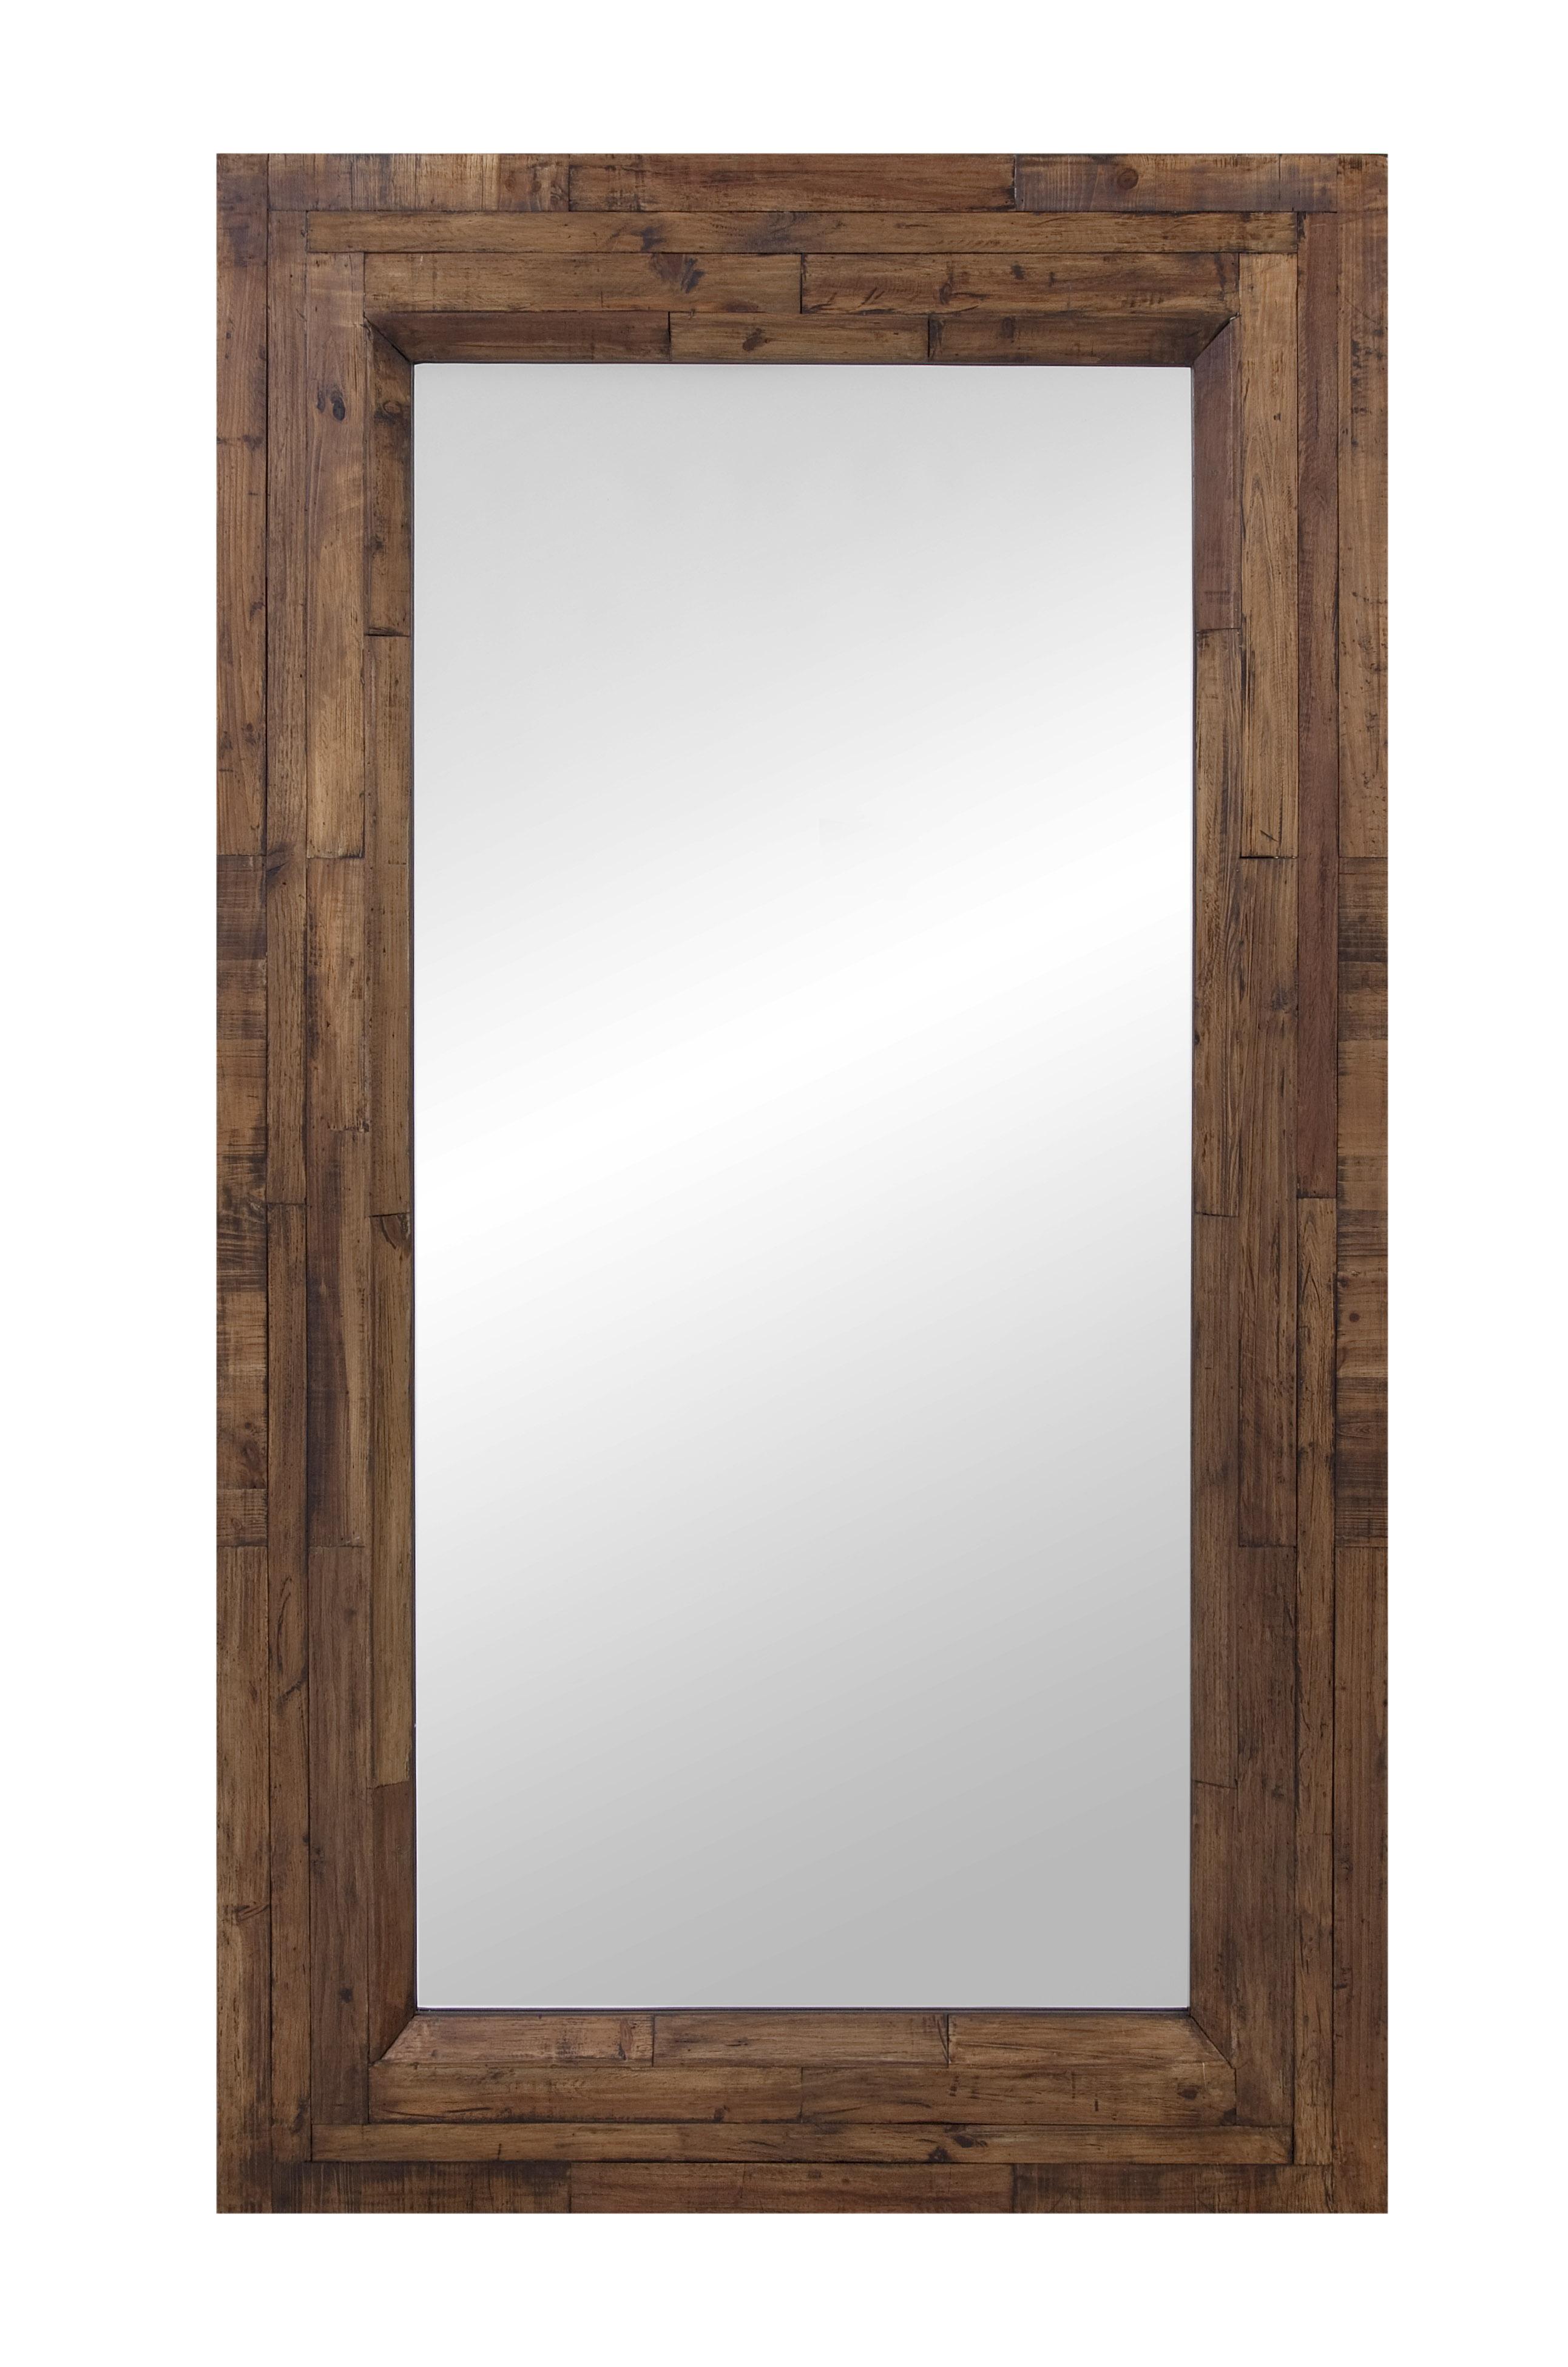 Belgian Luxe Higgins Leaner Mirror by Bassett Mirror at Alison Craig Home Furnishings